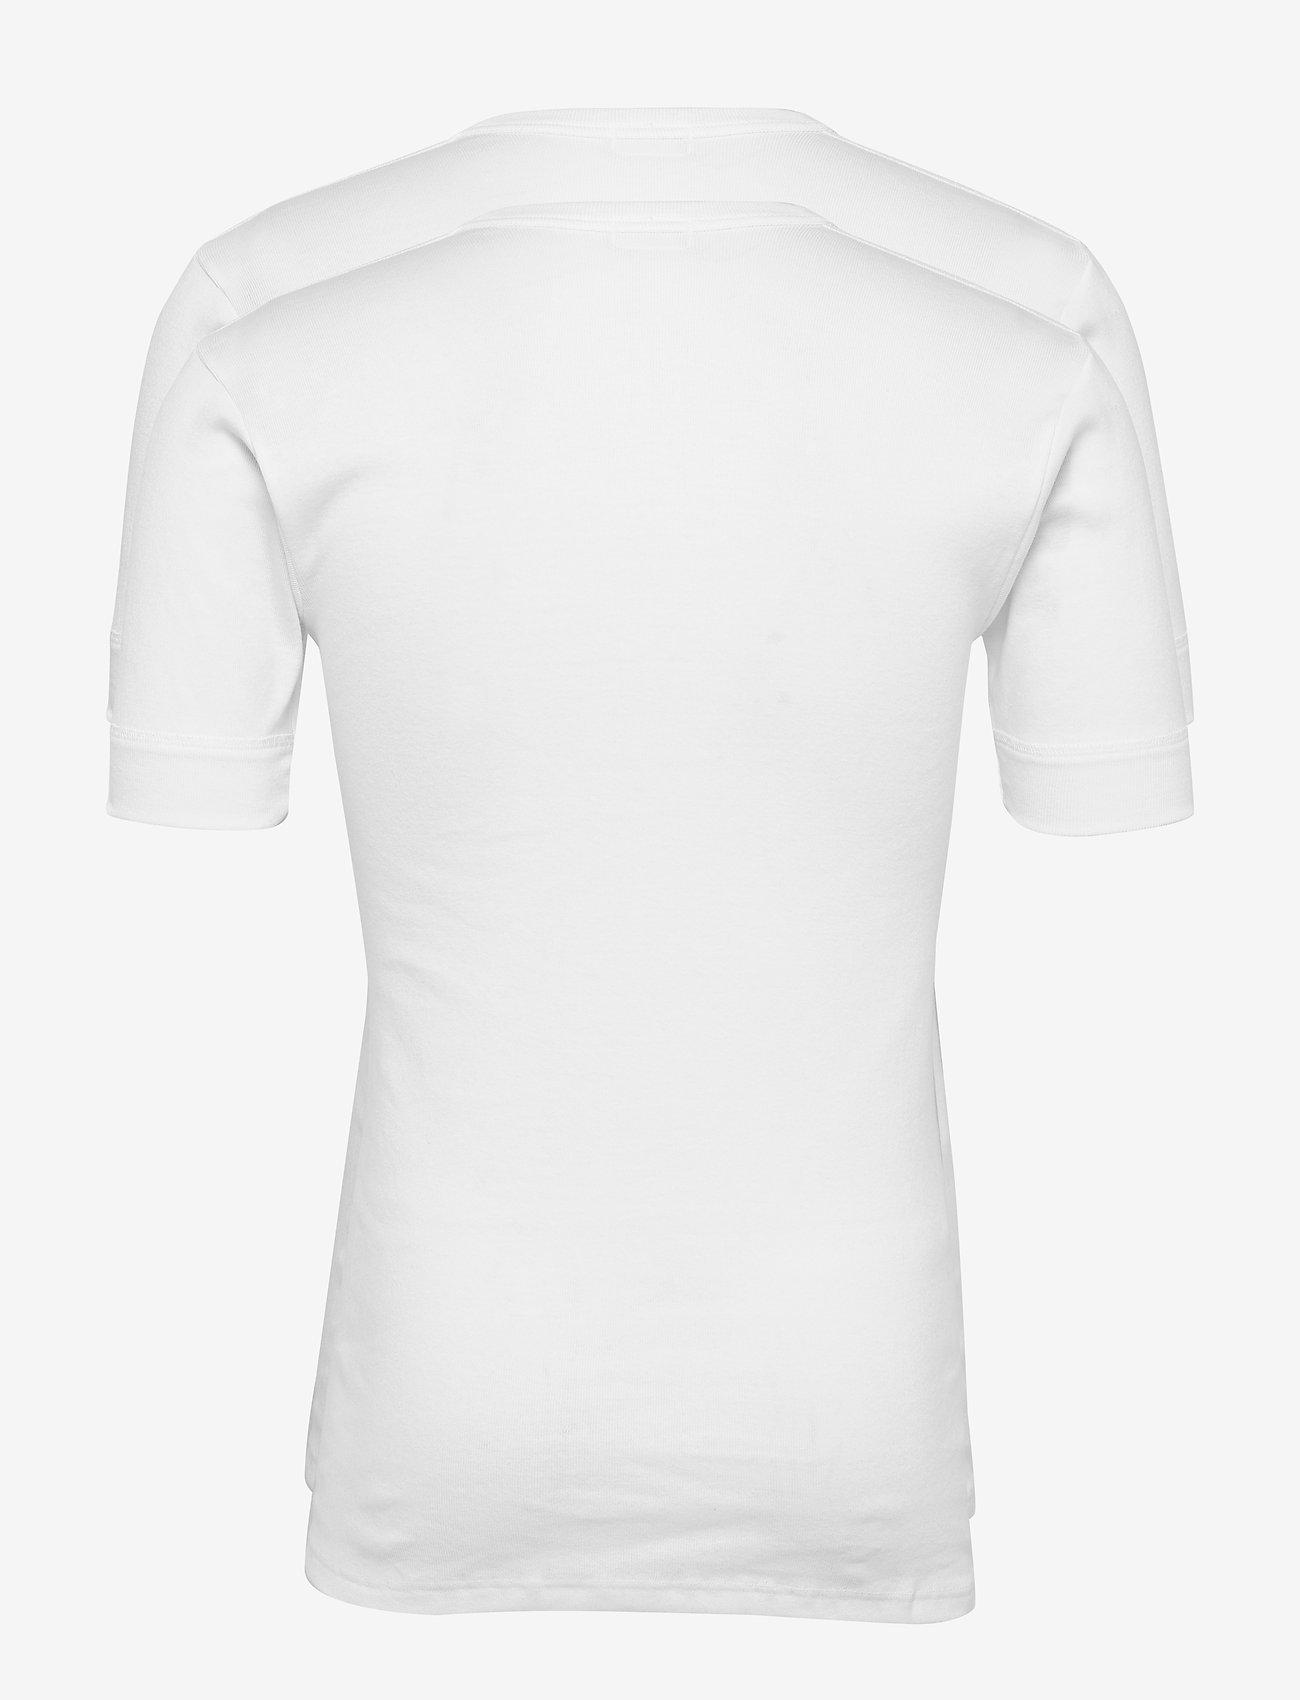 JBS - JBS t-shirt 2-pack organic - multipack - white - 1